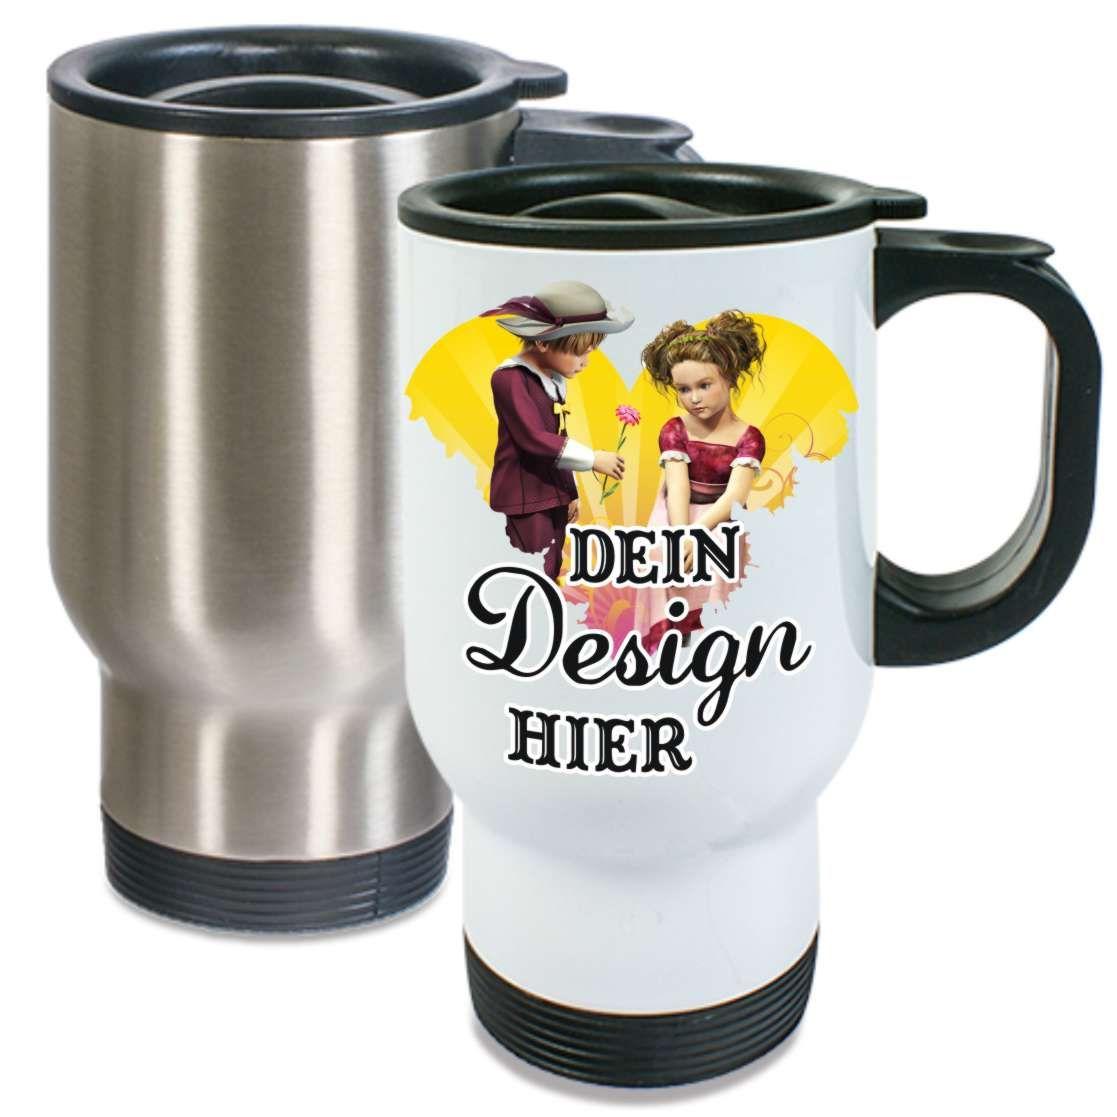 Tassen, Bierkrug, Gläser, Keramikbecher online selbst ...